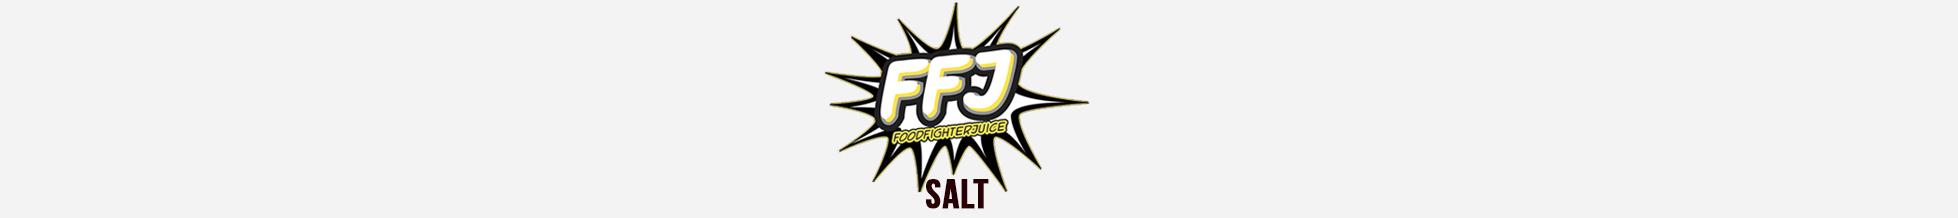 ffj-salt.jpg